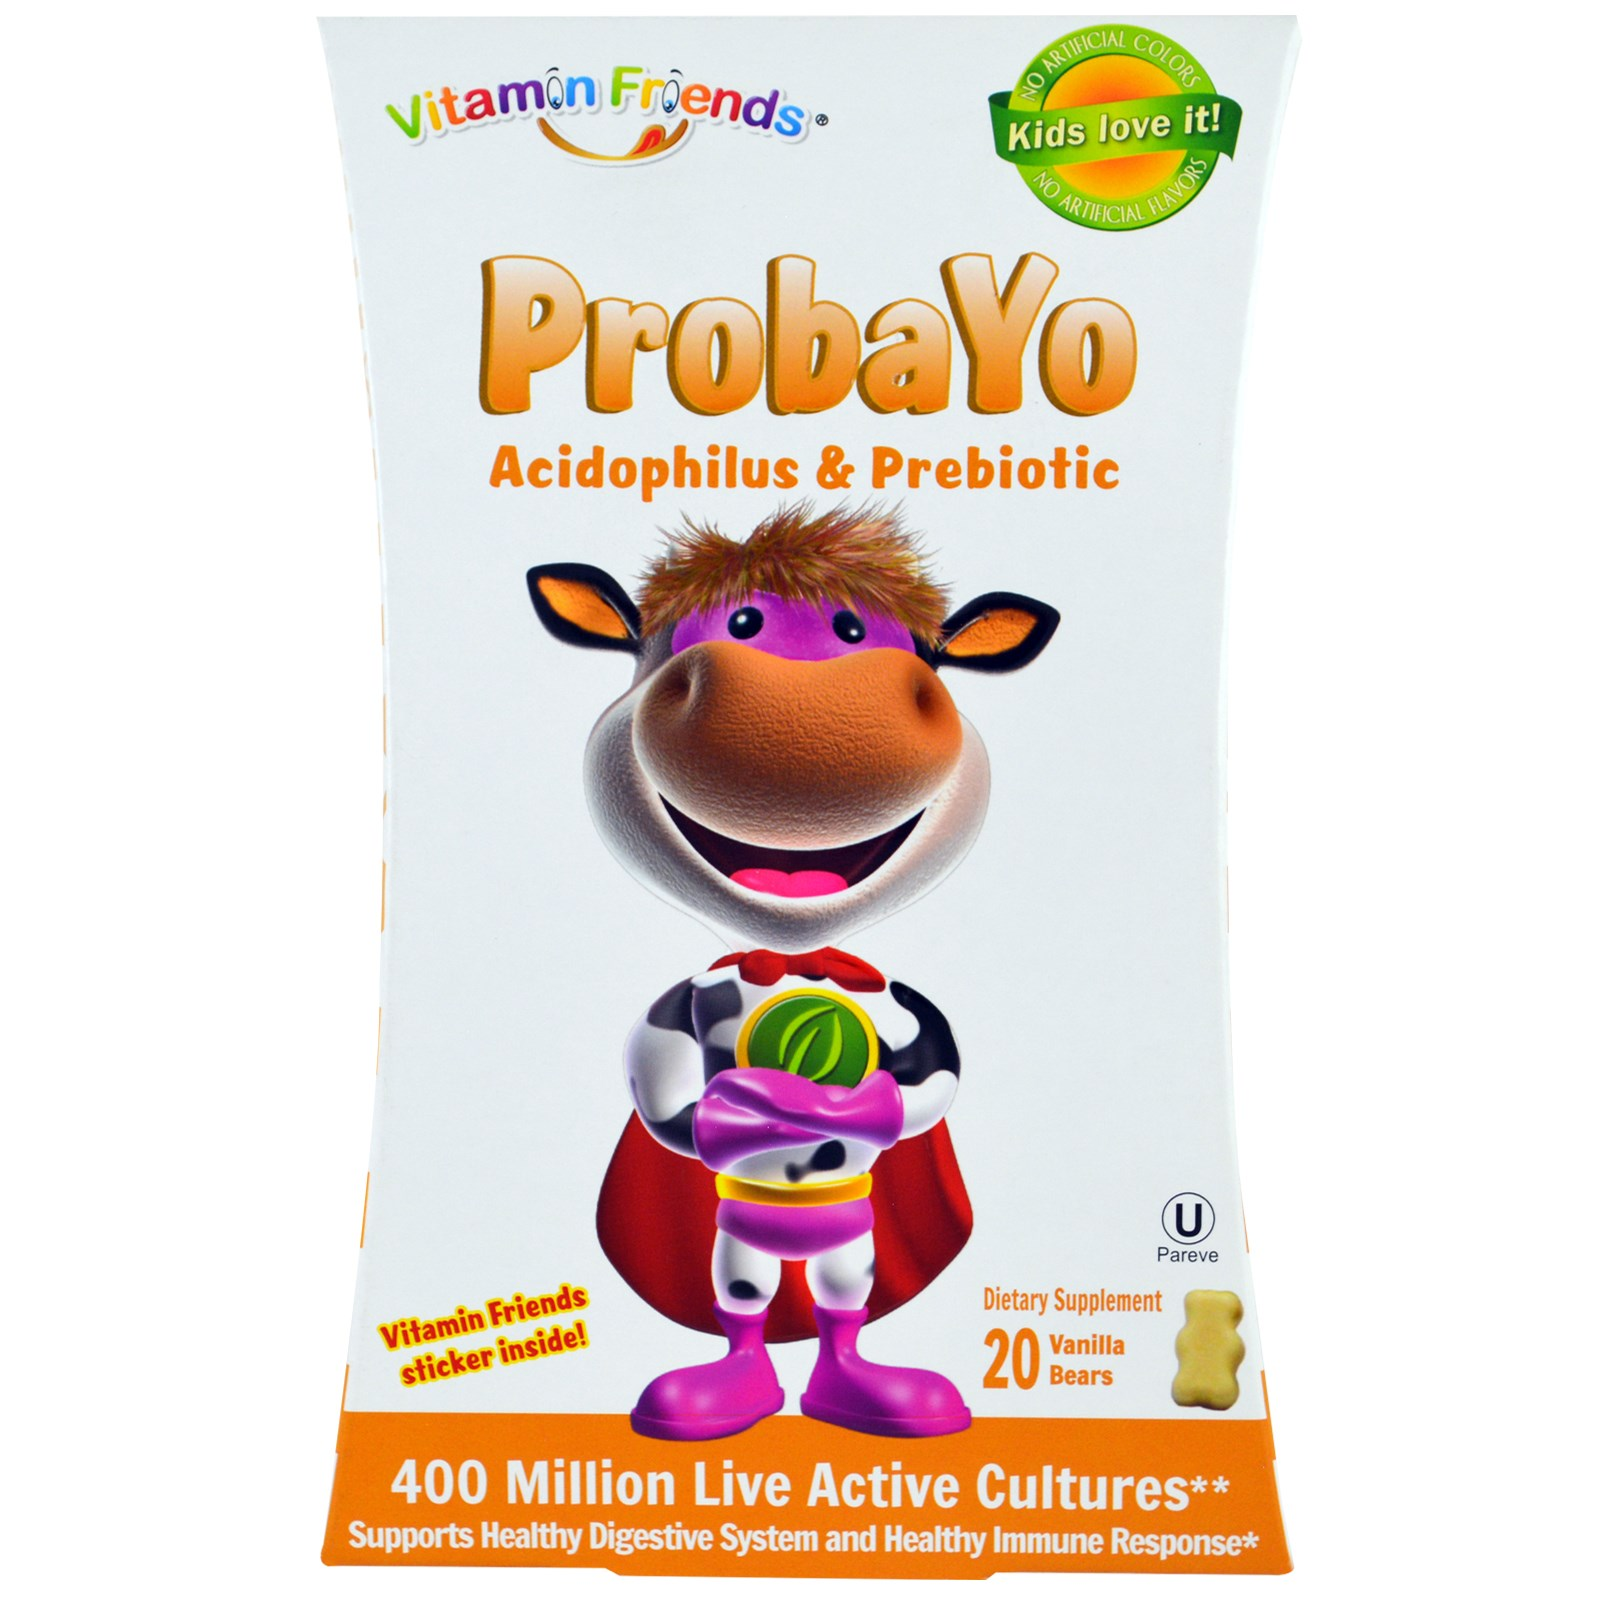 Vitamin Friends, Probayo, ацидофилус и пребиотик, 20 ванильных мишек